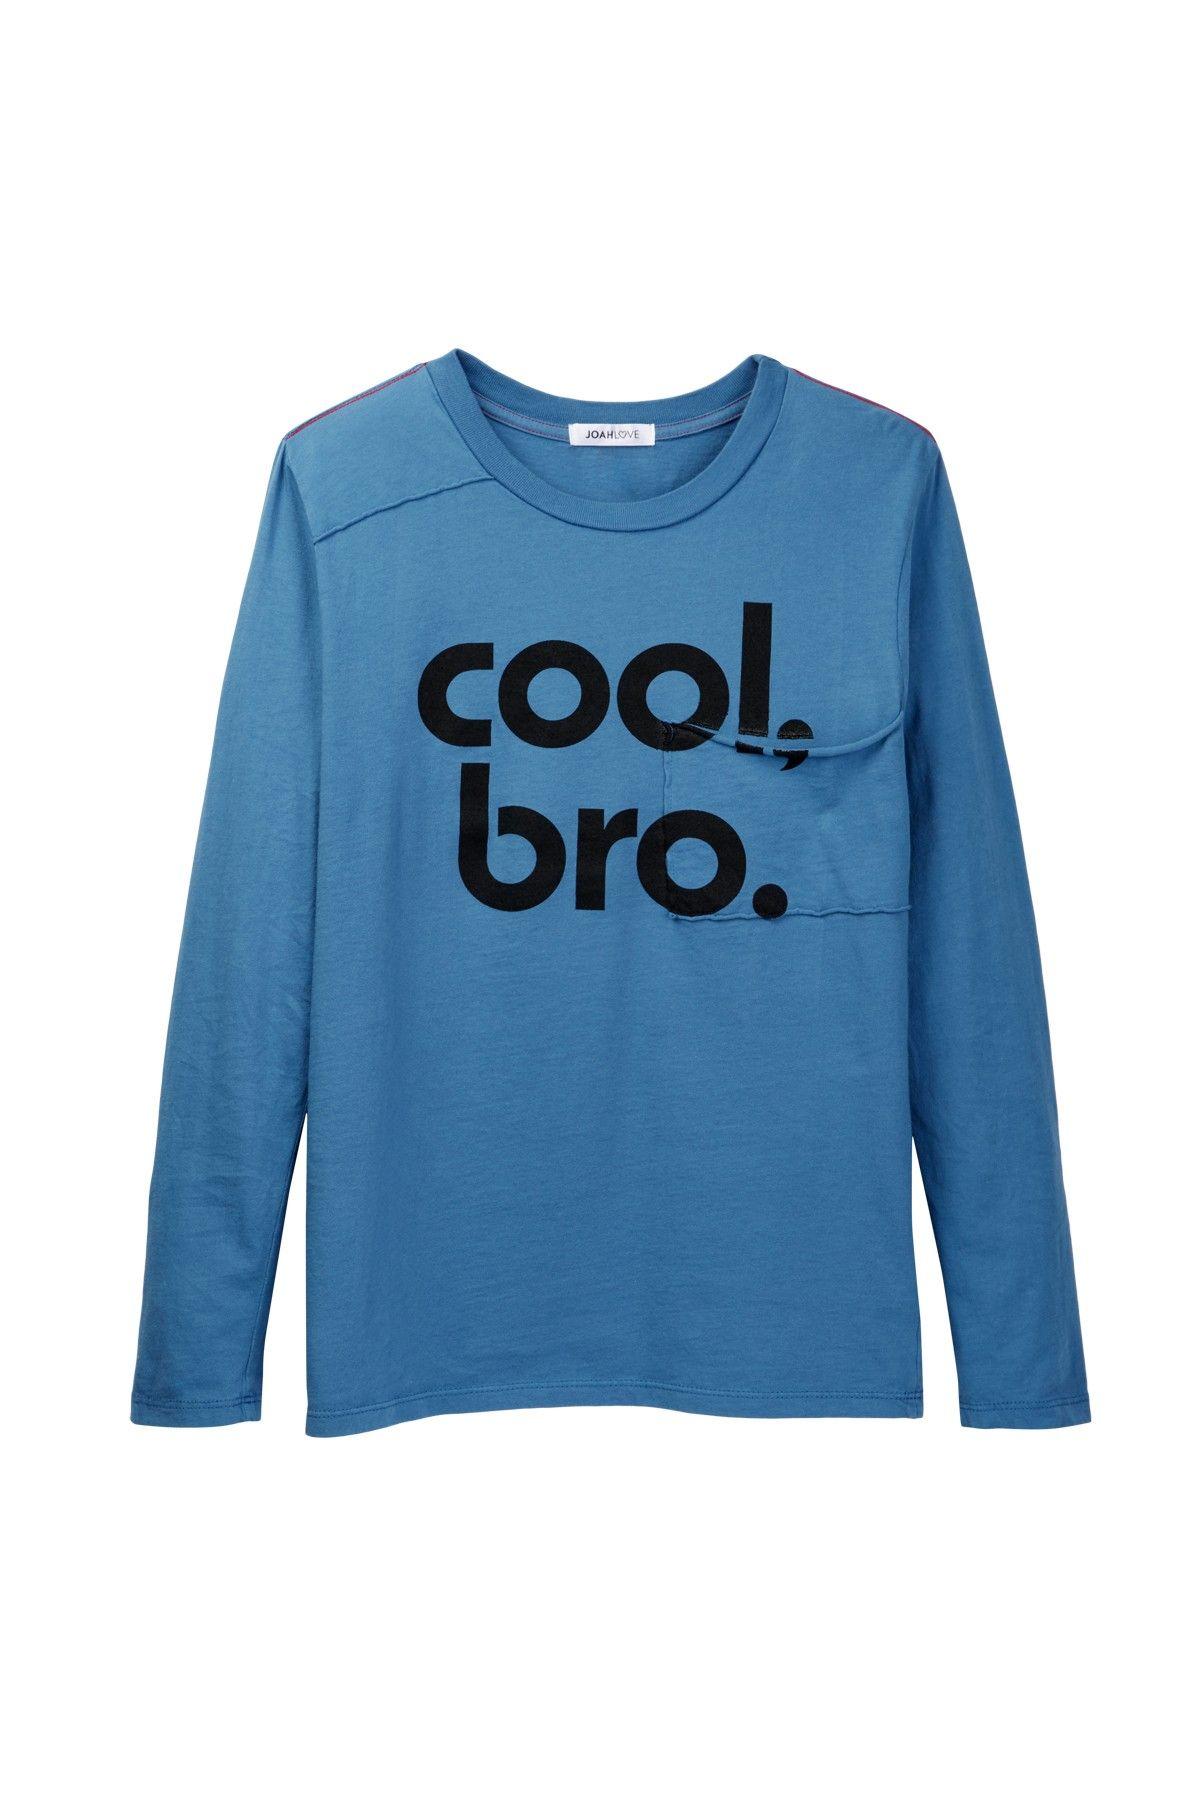 Cool Bro Long Sleeve Tee (Baby, Toddler, Little Boys, & Big Boys)